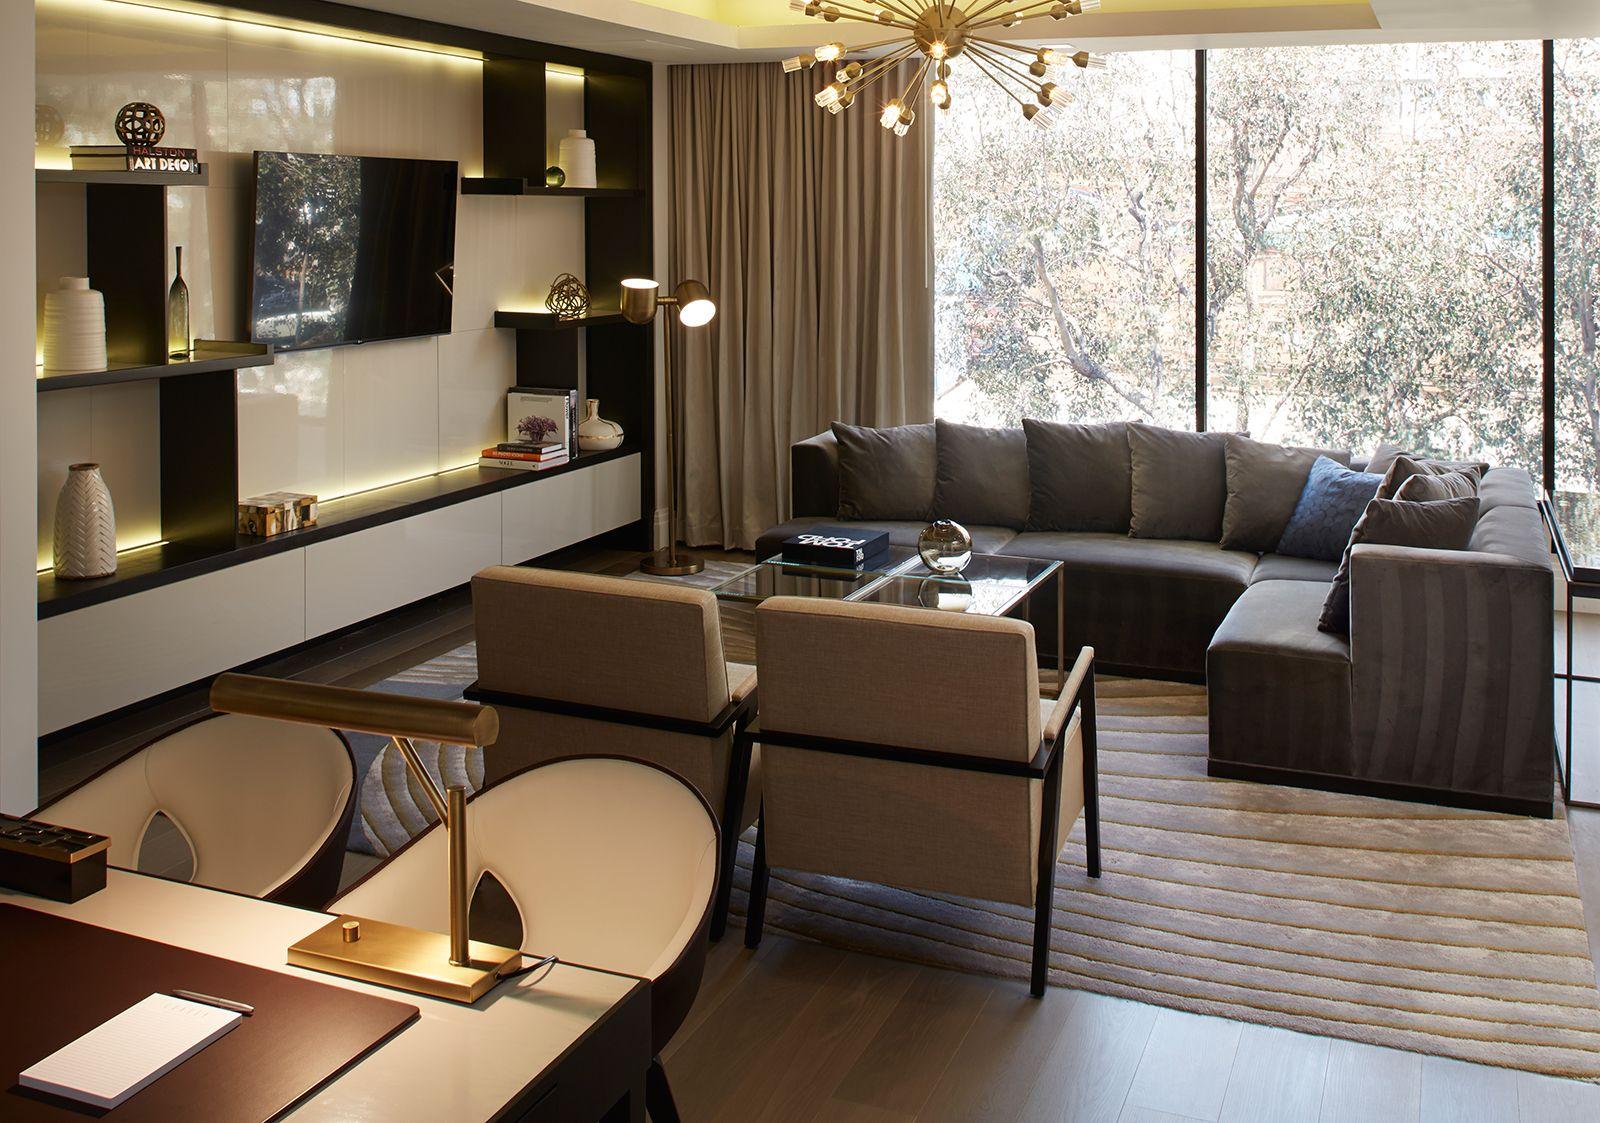 London West Hollywood Luxury hotels interior, Hotel